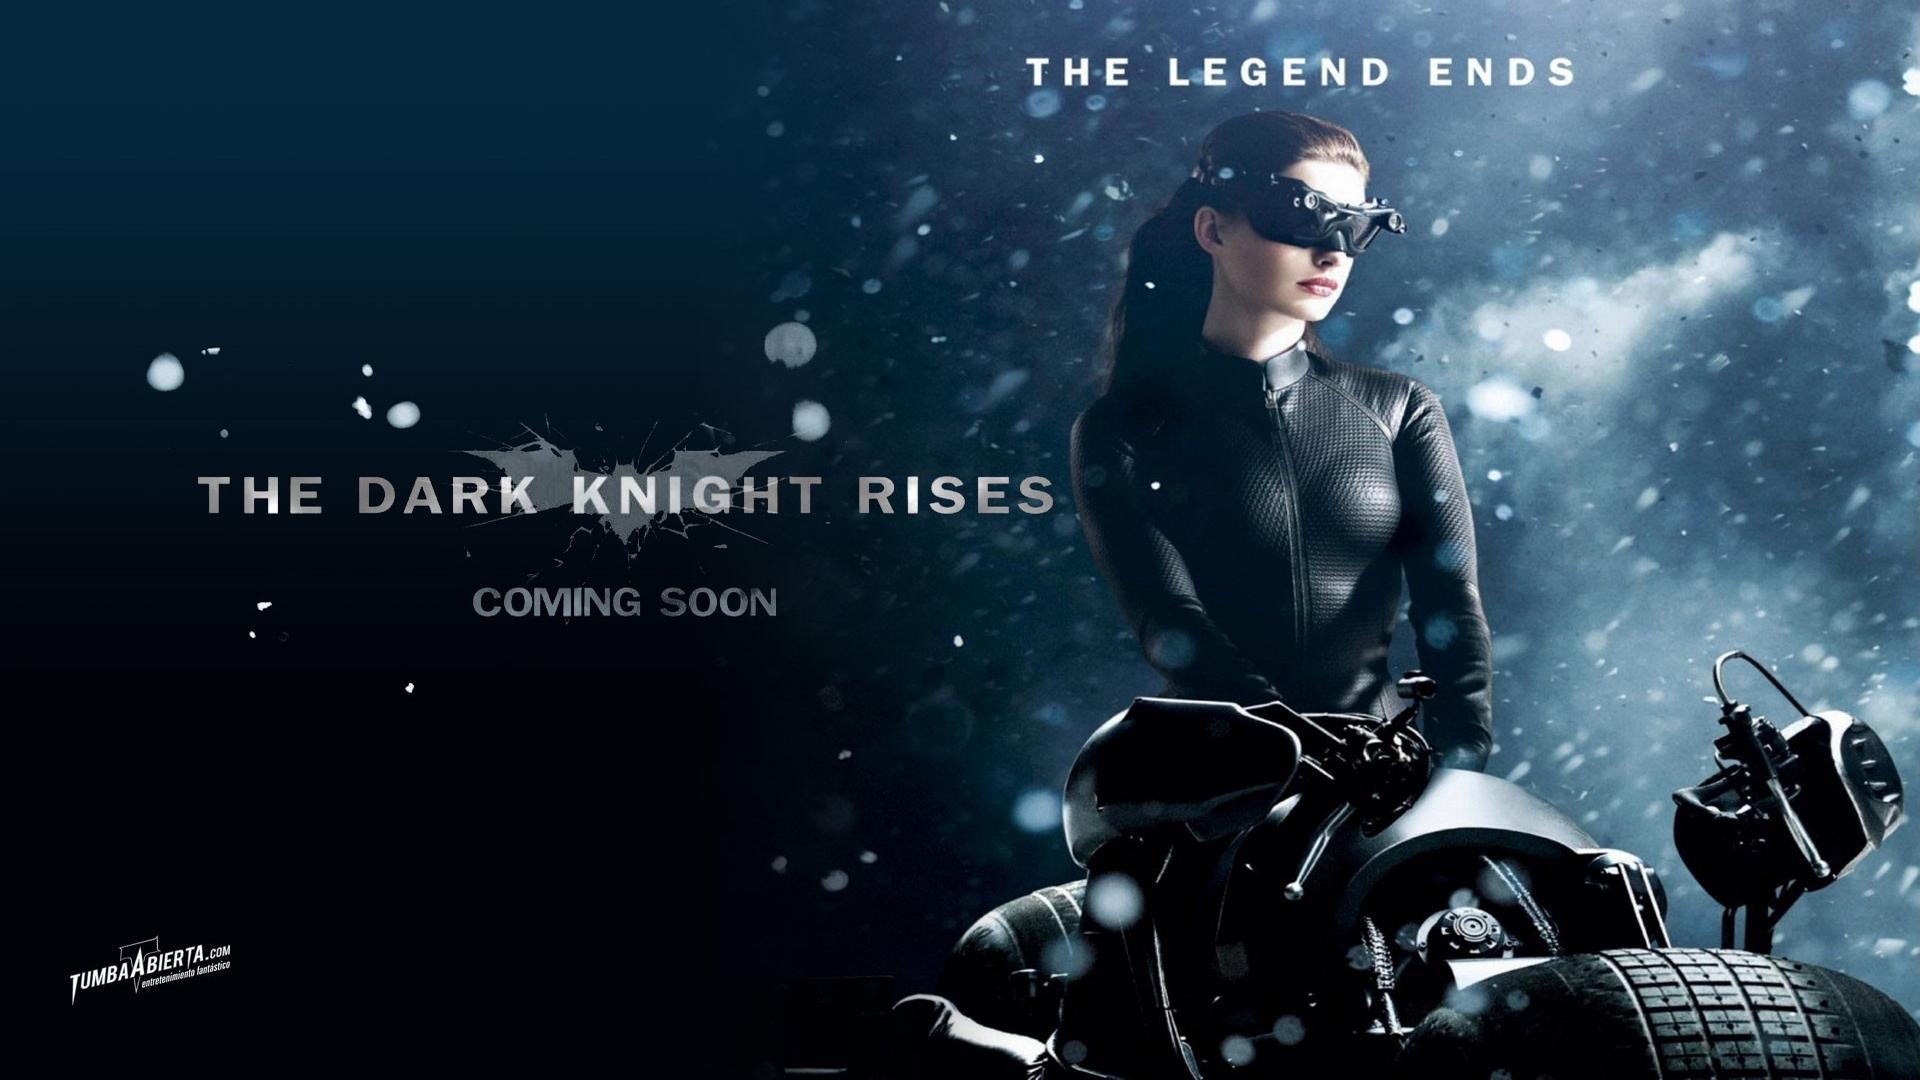 Download Dark Knight Rises Hd Wallpapers And Desktop